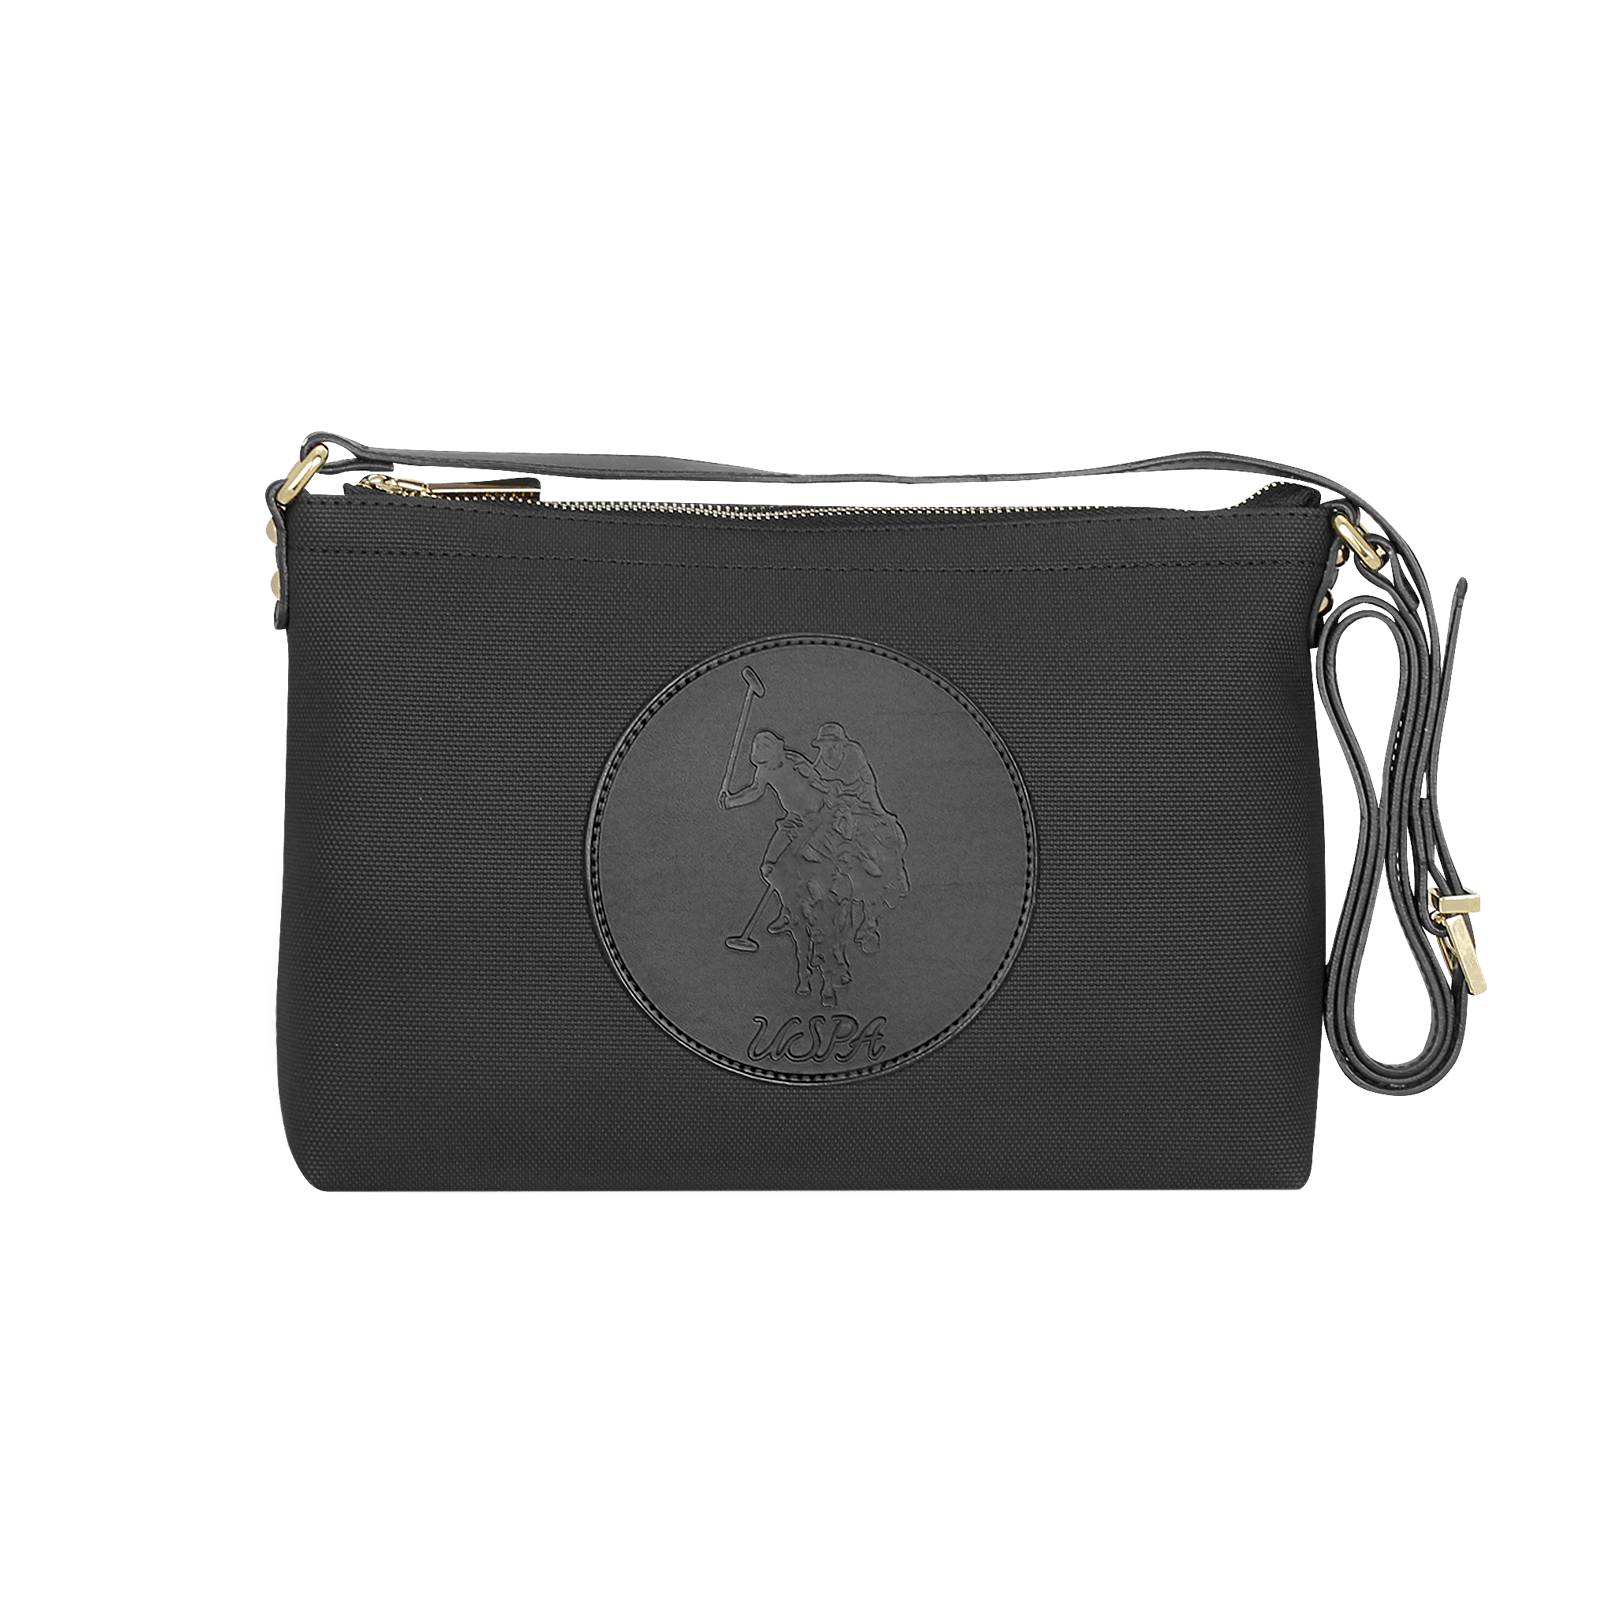 Taxach - U.S. Polo ASSN Women s Handbag made of synthetic leather ... 8c59da224c387